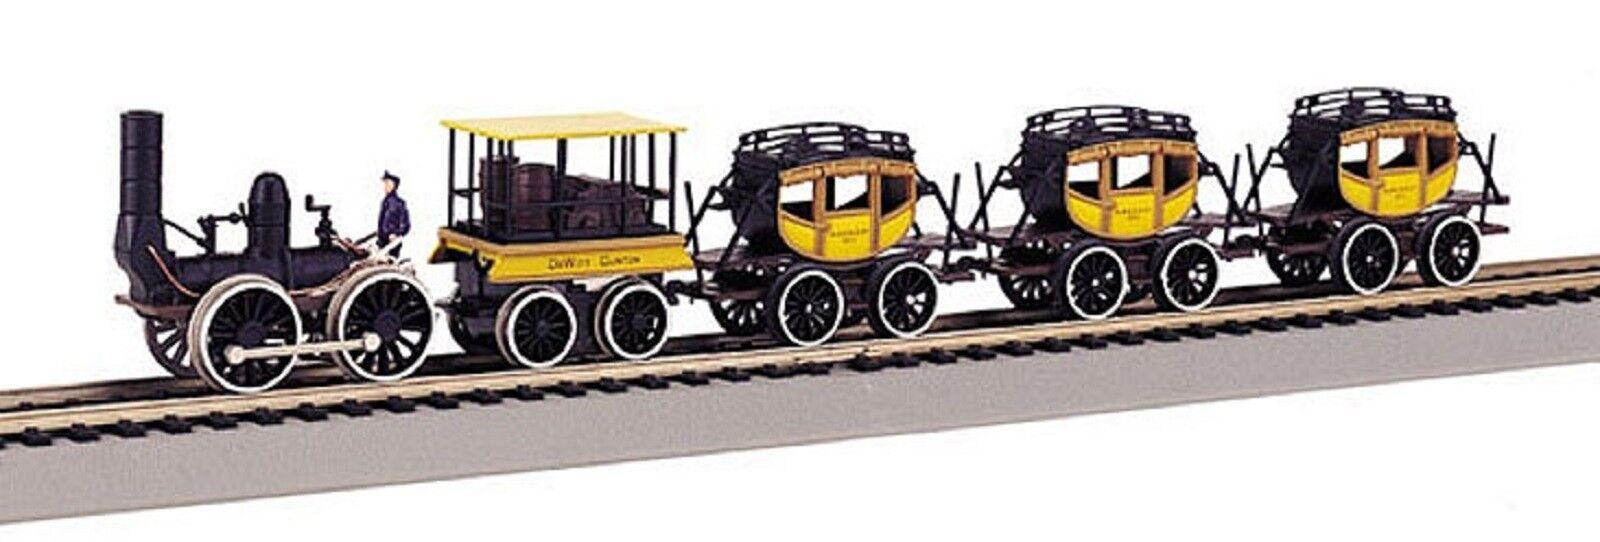 641 Coffret lokvagnar tåg vapeur DeWitt Clinton 1  87 HO